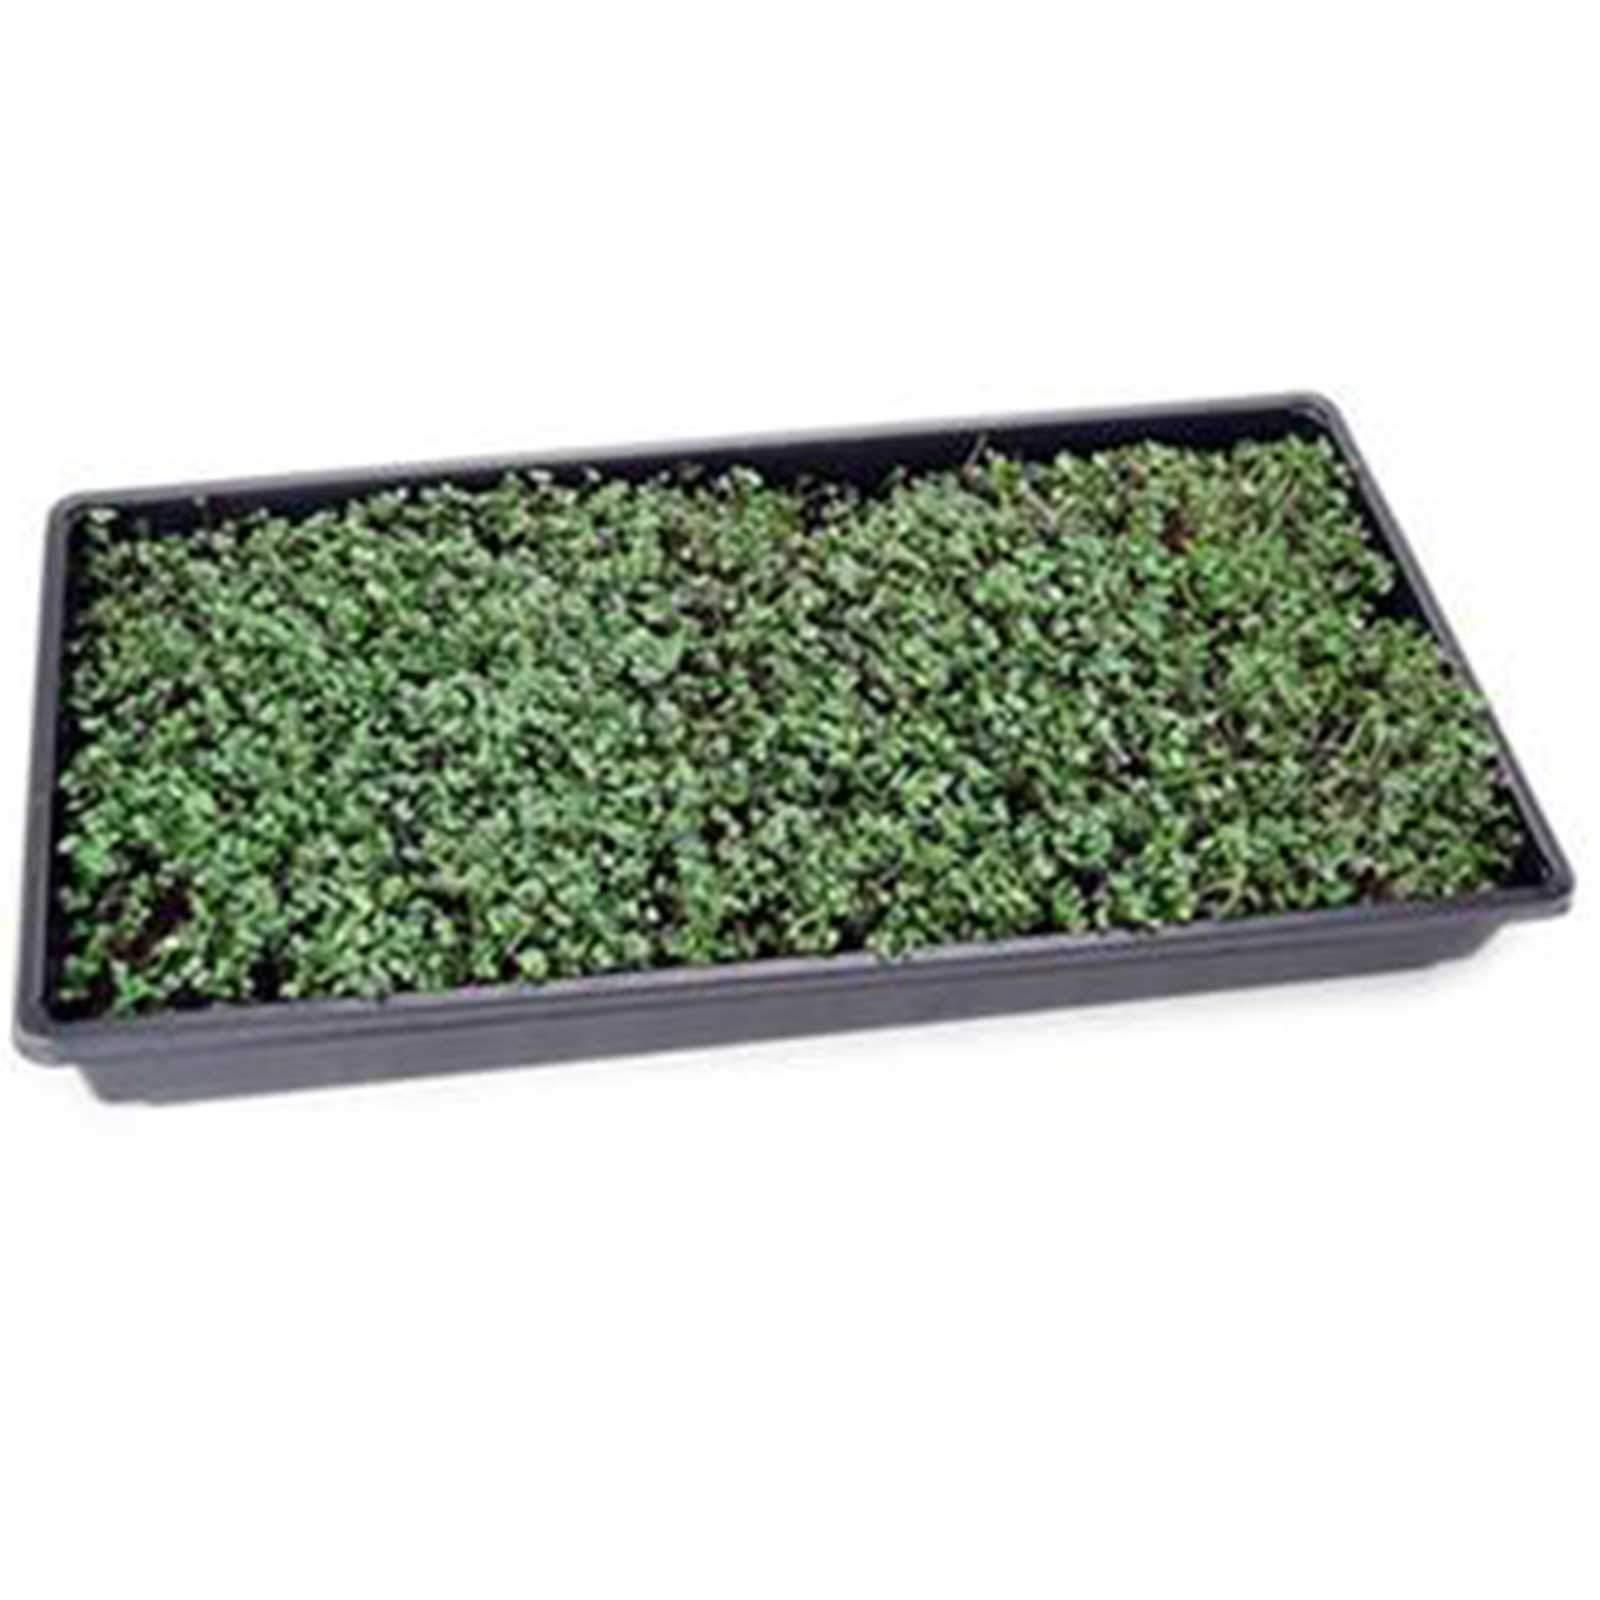 Basic Salad Mix Micro Greens Seeds: 25 Lb - Bulk Non-GMO Seed Blend: Broccoli, Kale, Kohlrabi, Cabbage, Arugula, More by Mountain Valley Seed Company (Image #4)